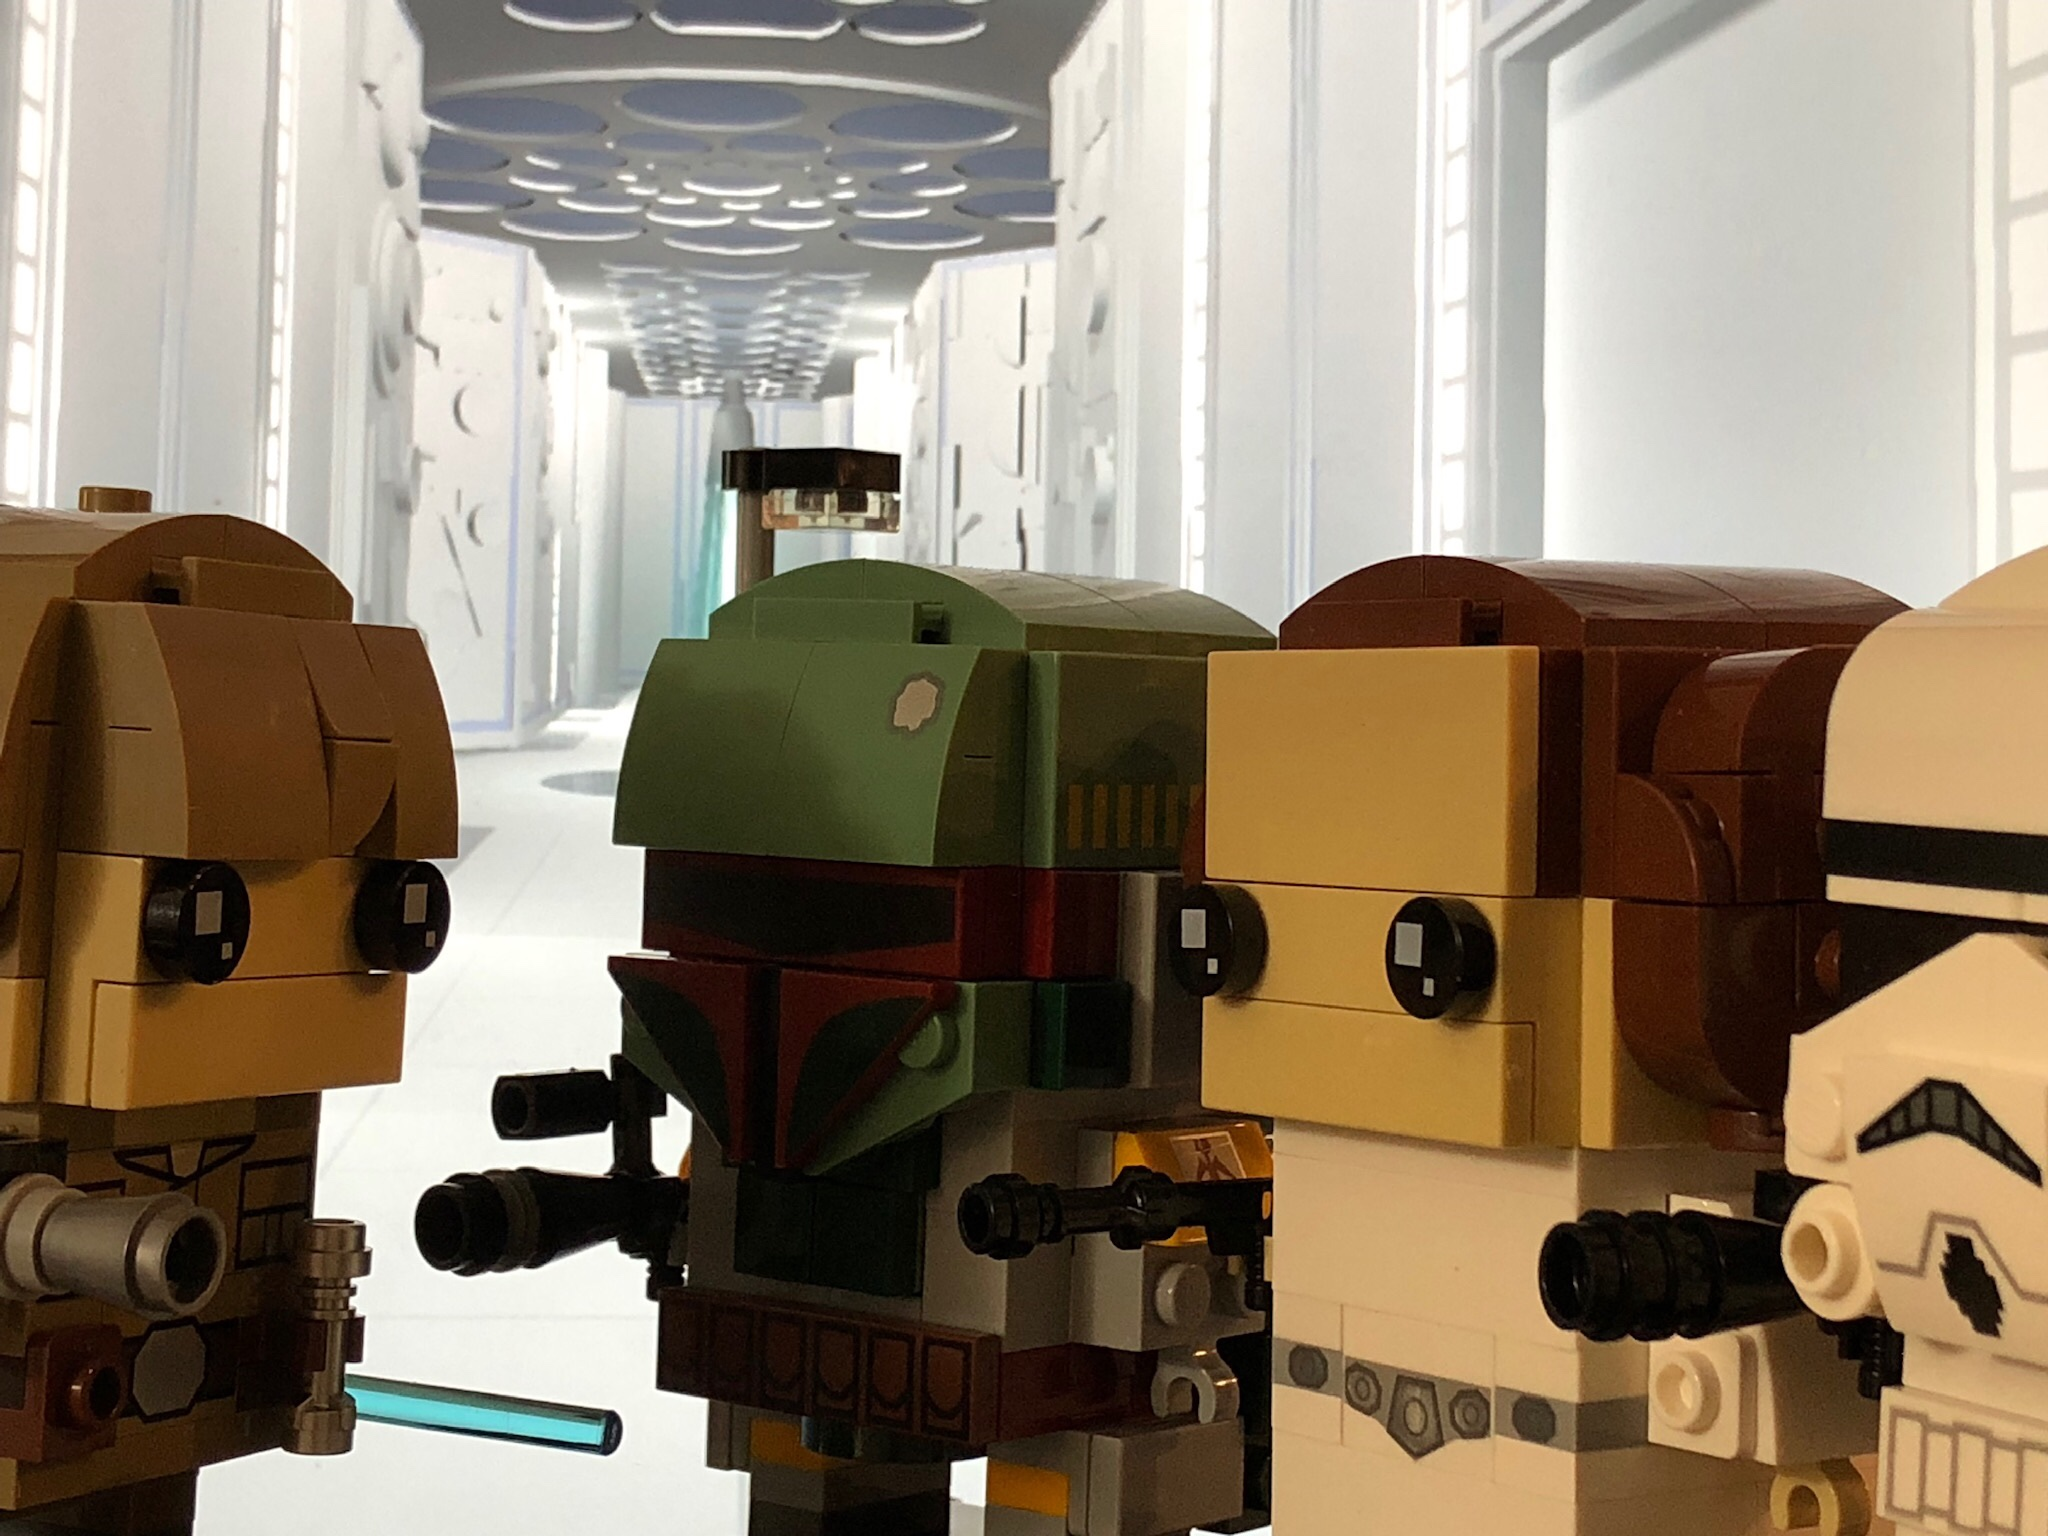 LEGO Brickheadz Luke Skywalker, Boba Fett, Princess Leia, Stormtrooper